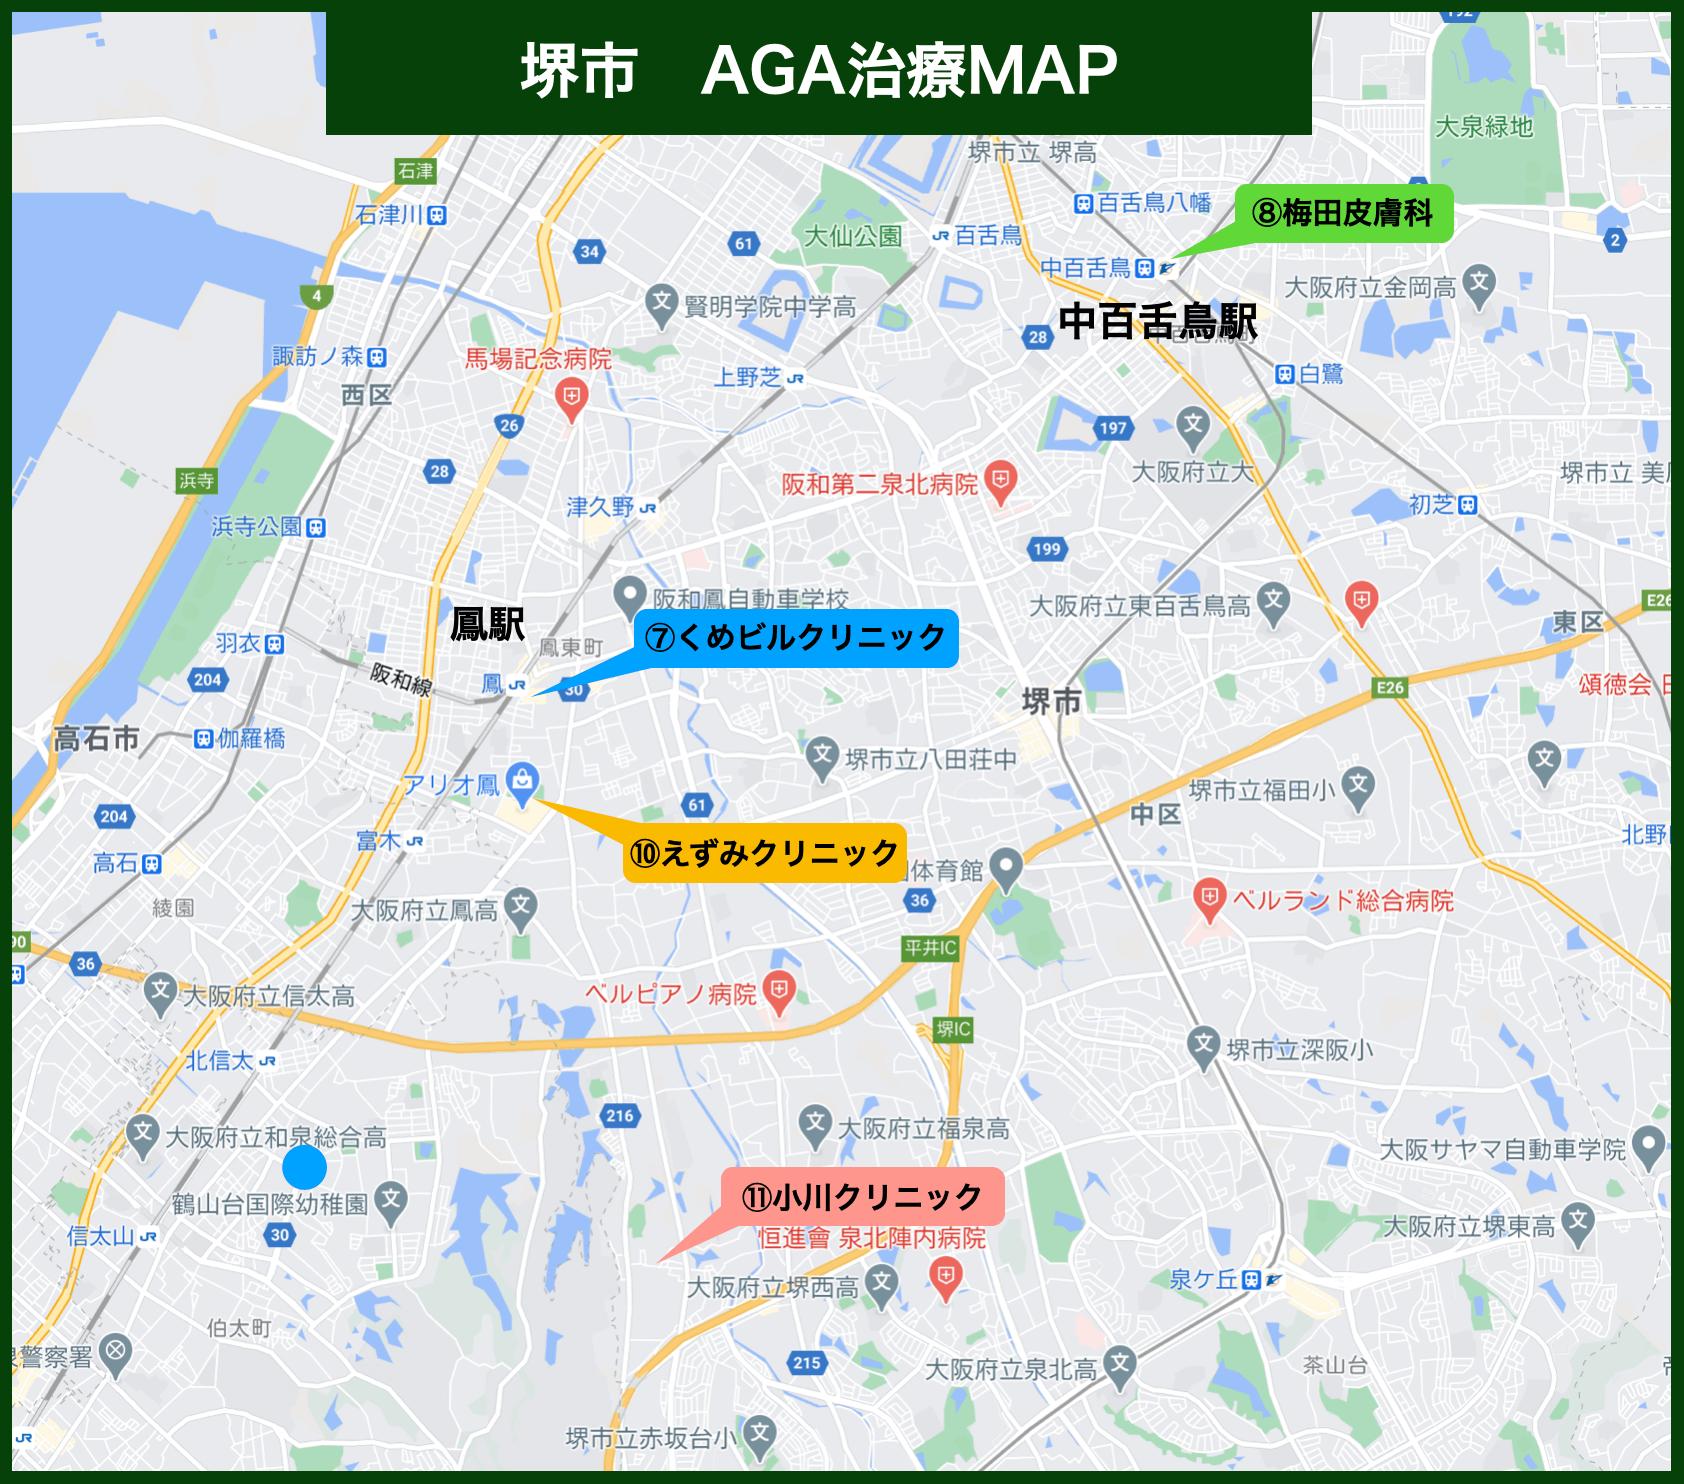 堺市 AGA治療MAP